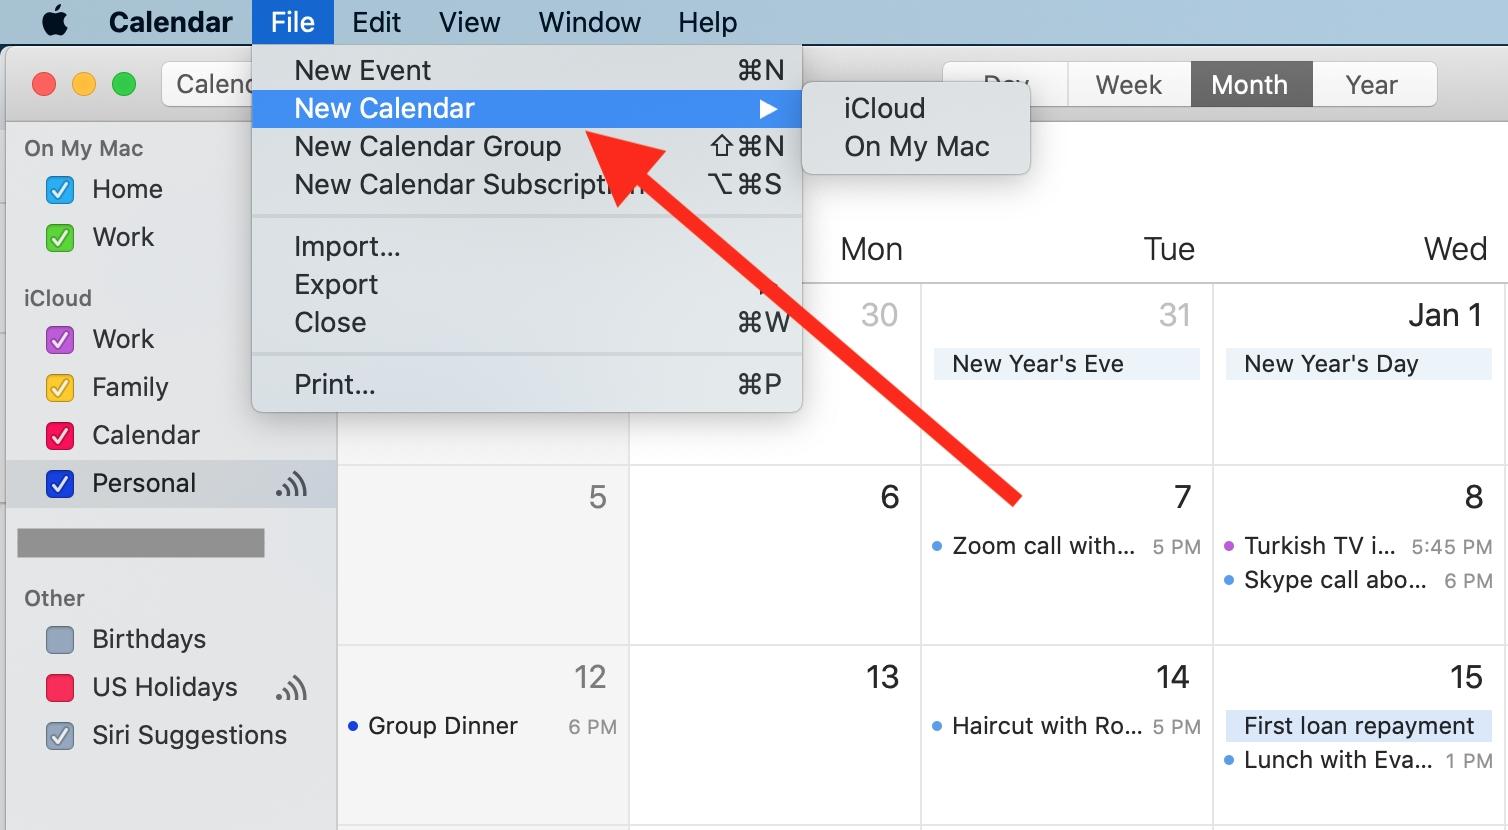 How To Make A Family To-Do List And Calendar | Pcmag